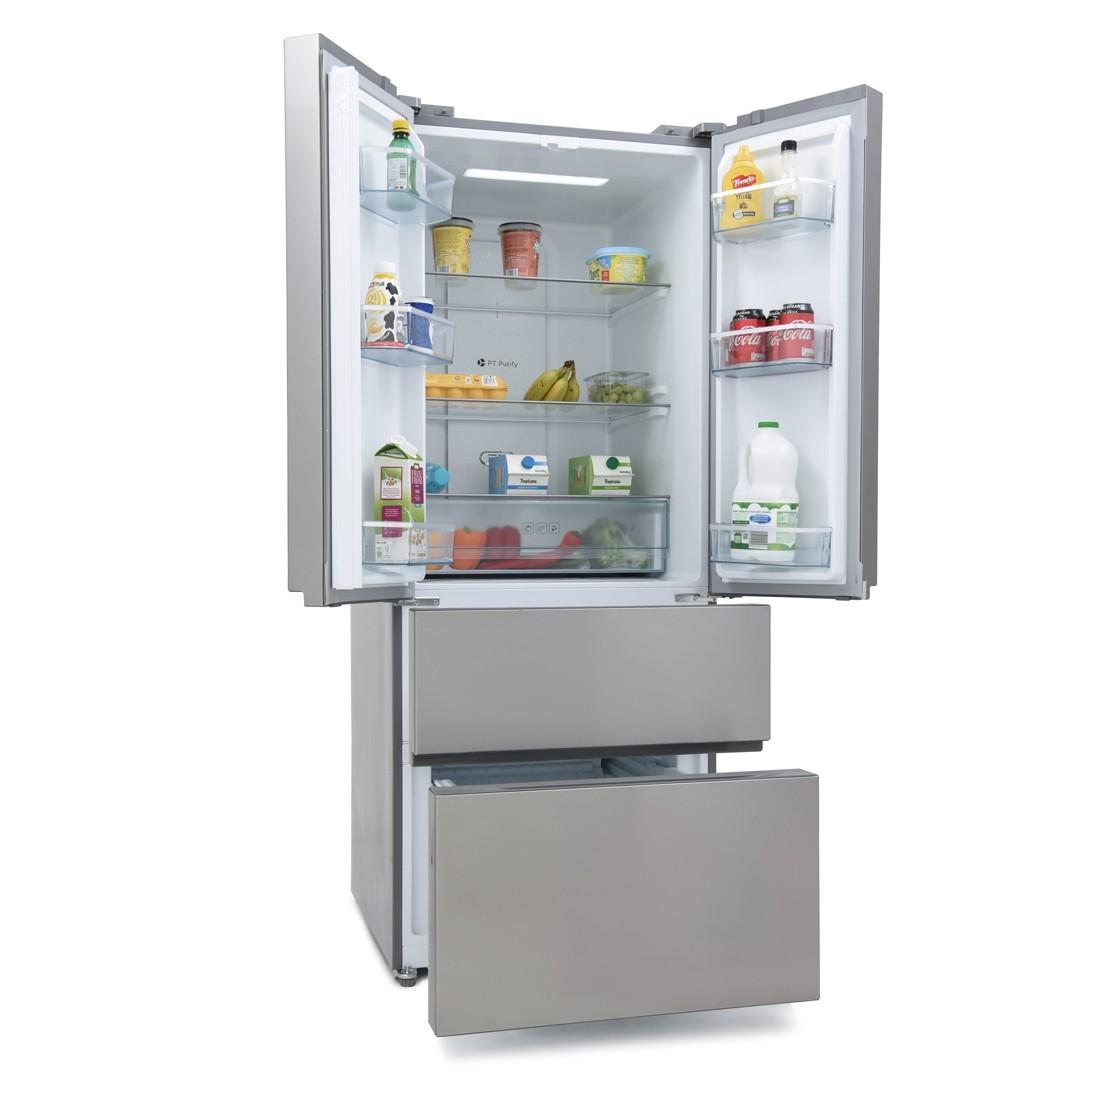 Montpellier MFD71X Fridge Freezer